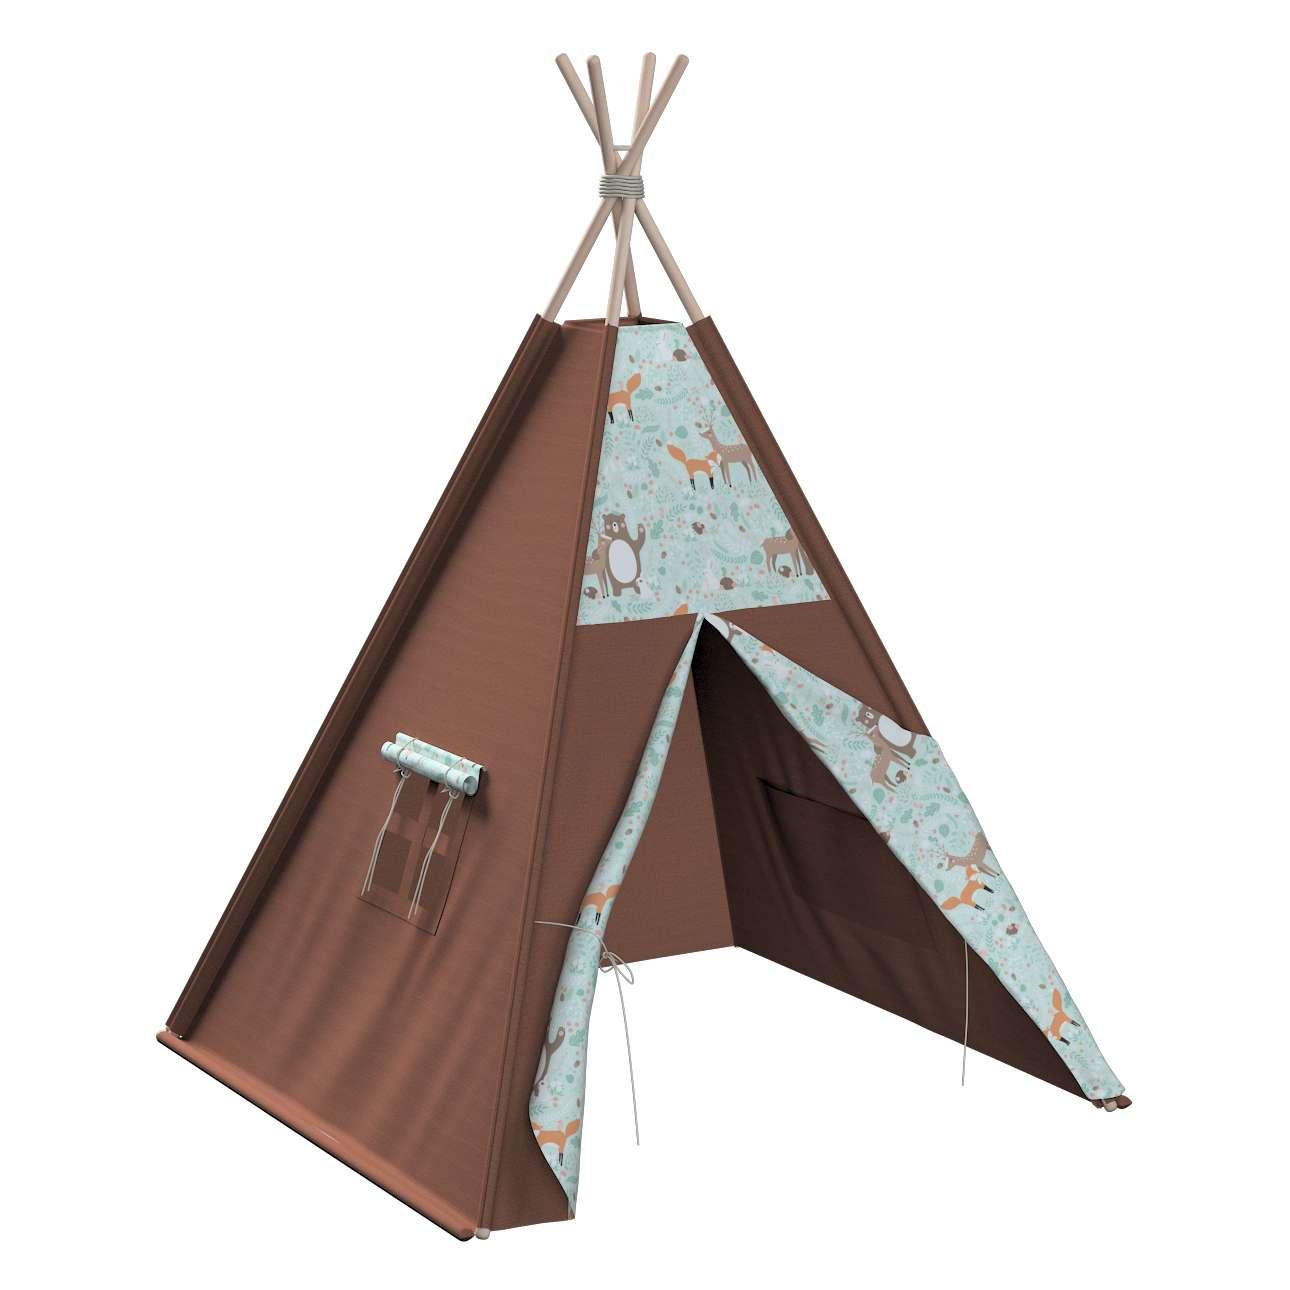 Tipi-Zelt von der Kollektion Magic Collection, Stoff: 500-15